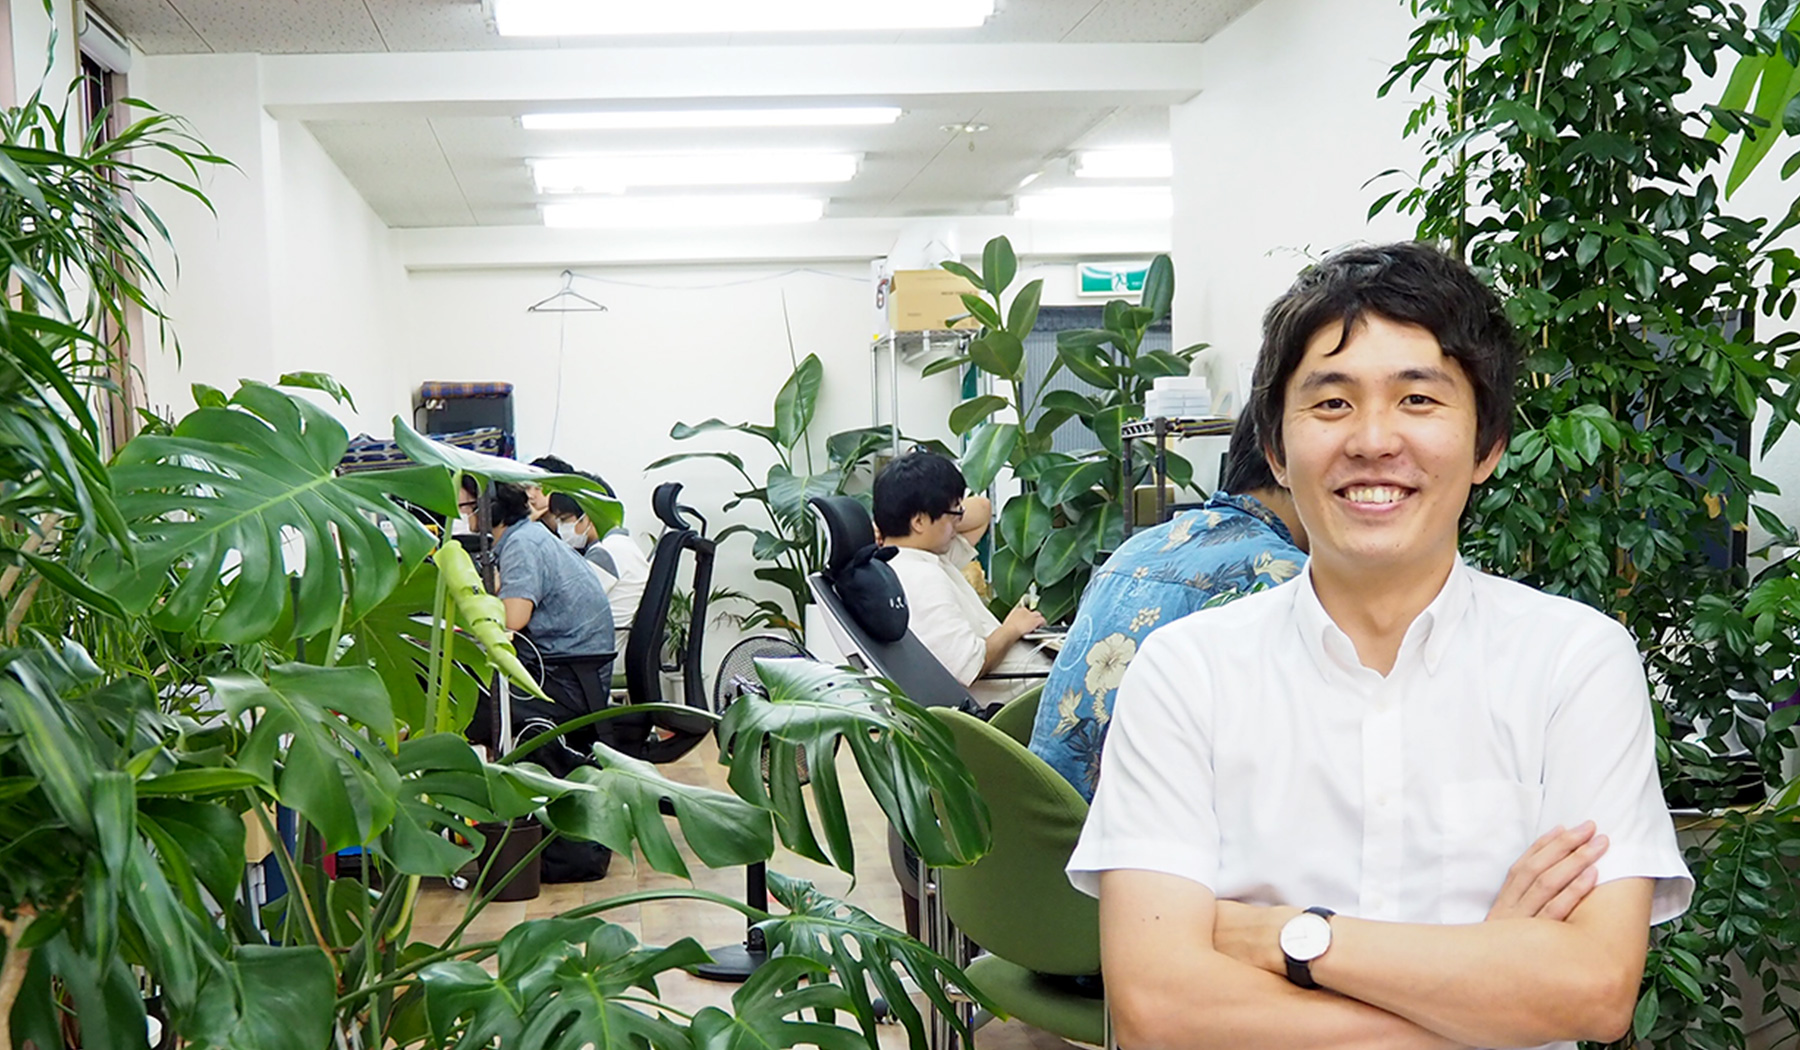 株式会社バイオーム 代表取締役 藤木 庄五郎